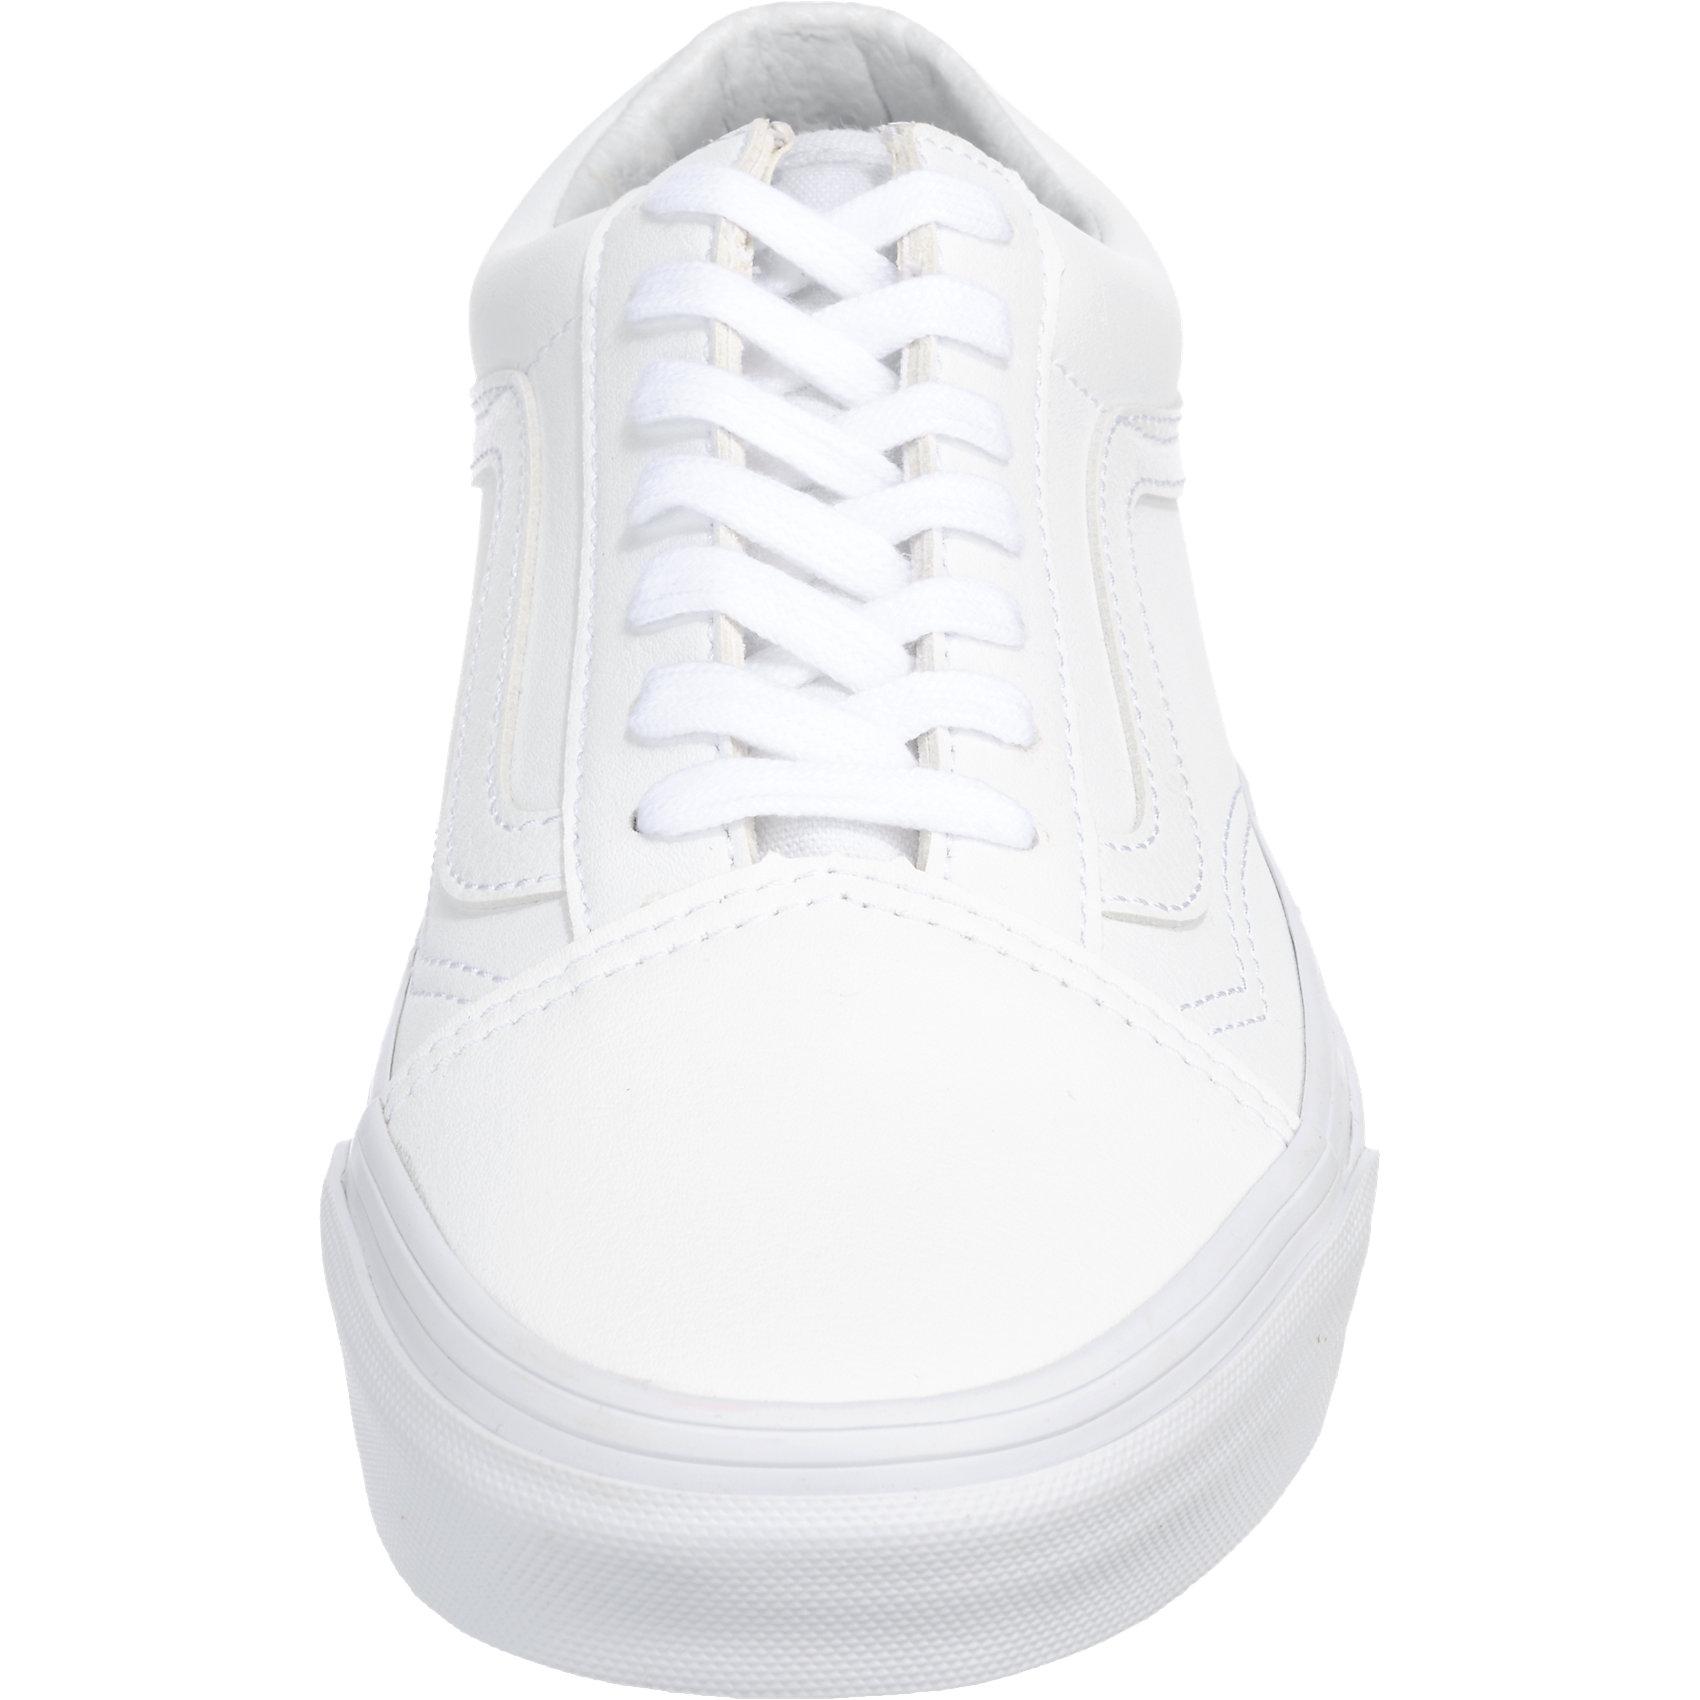 e323f35cfac13 ... Nike Free RN 831508 008 Mens Running Shoes Size Size Size 10.5 Black White   ...